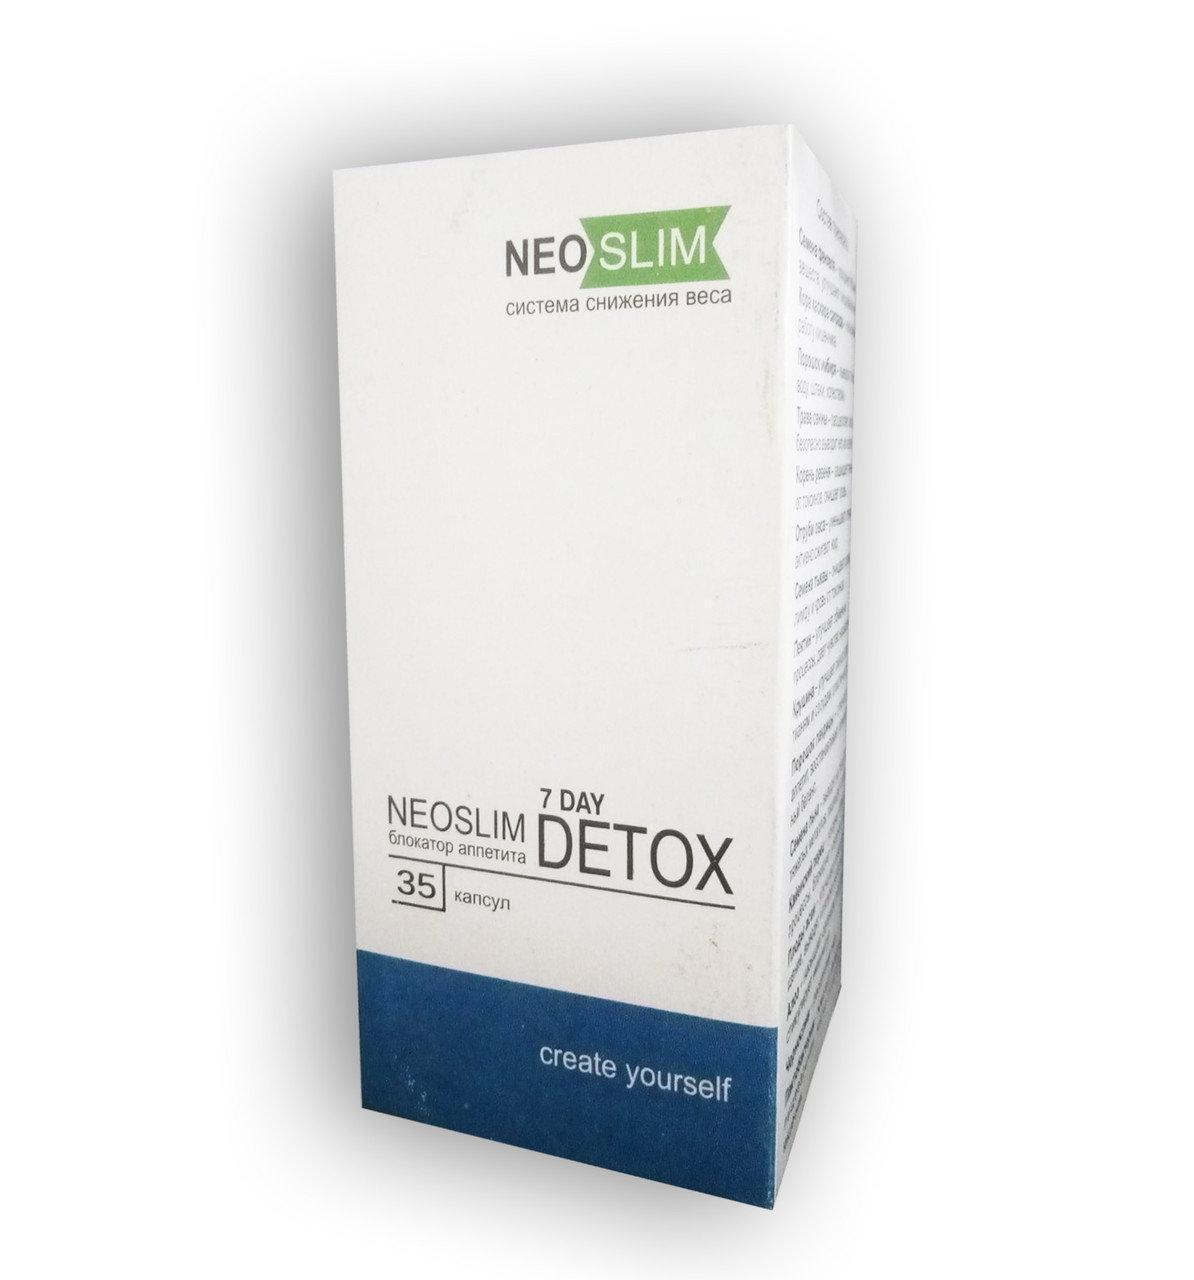 Neo Slim 7 Day Detox (35)- Комплекс для снижения веса (Нео Слим Севен Дей Детокс) ViP